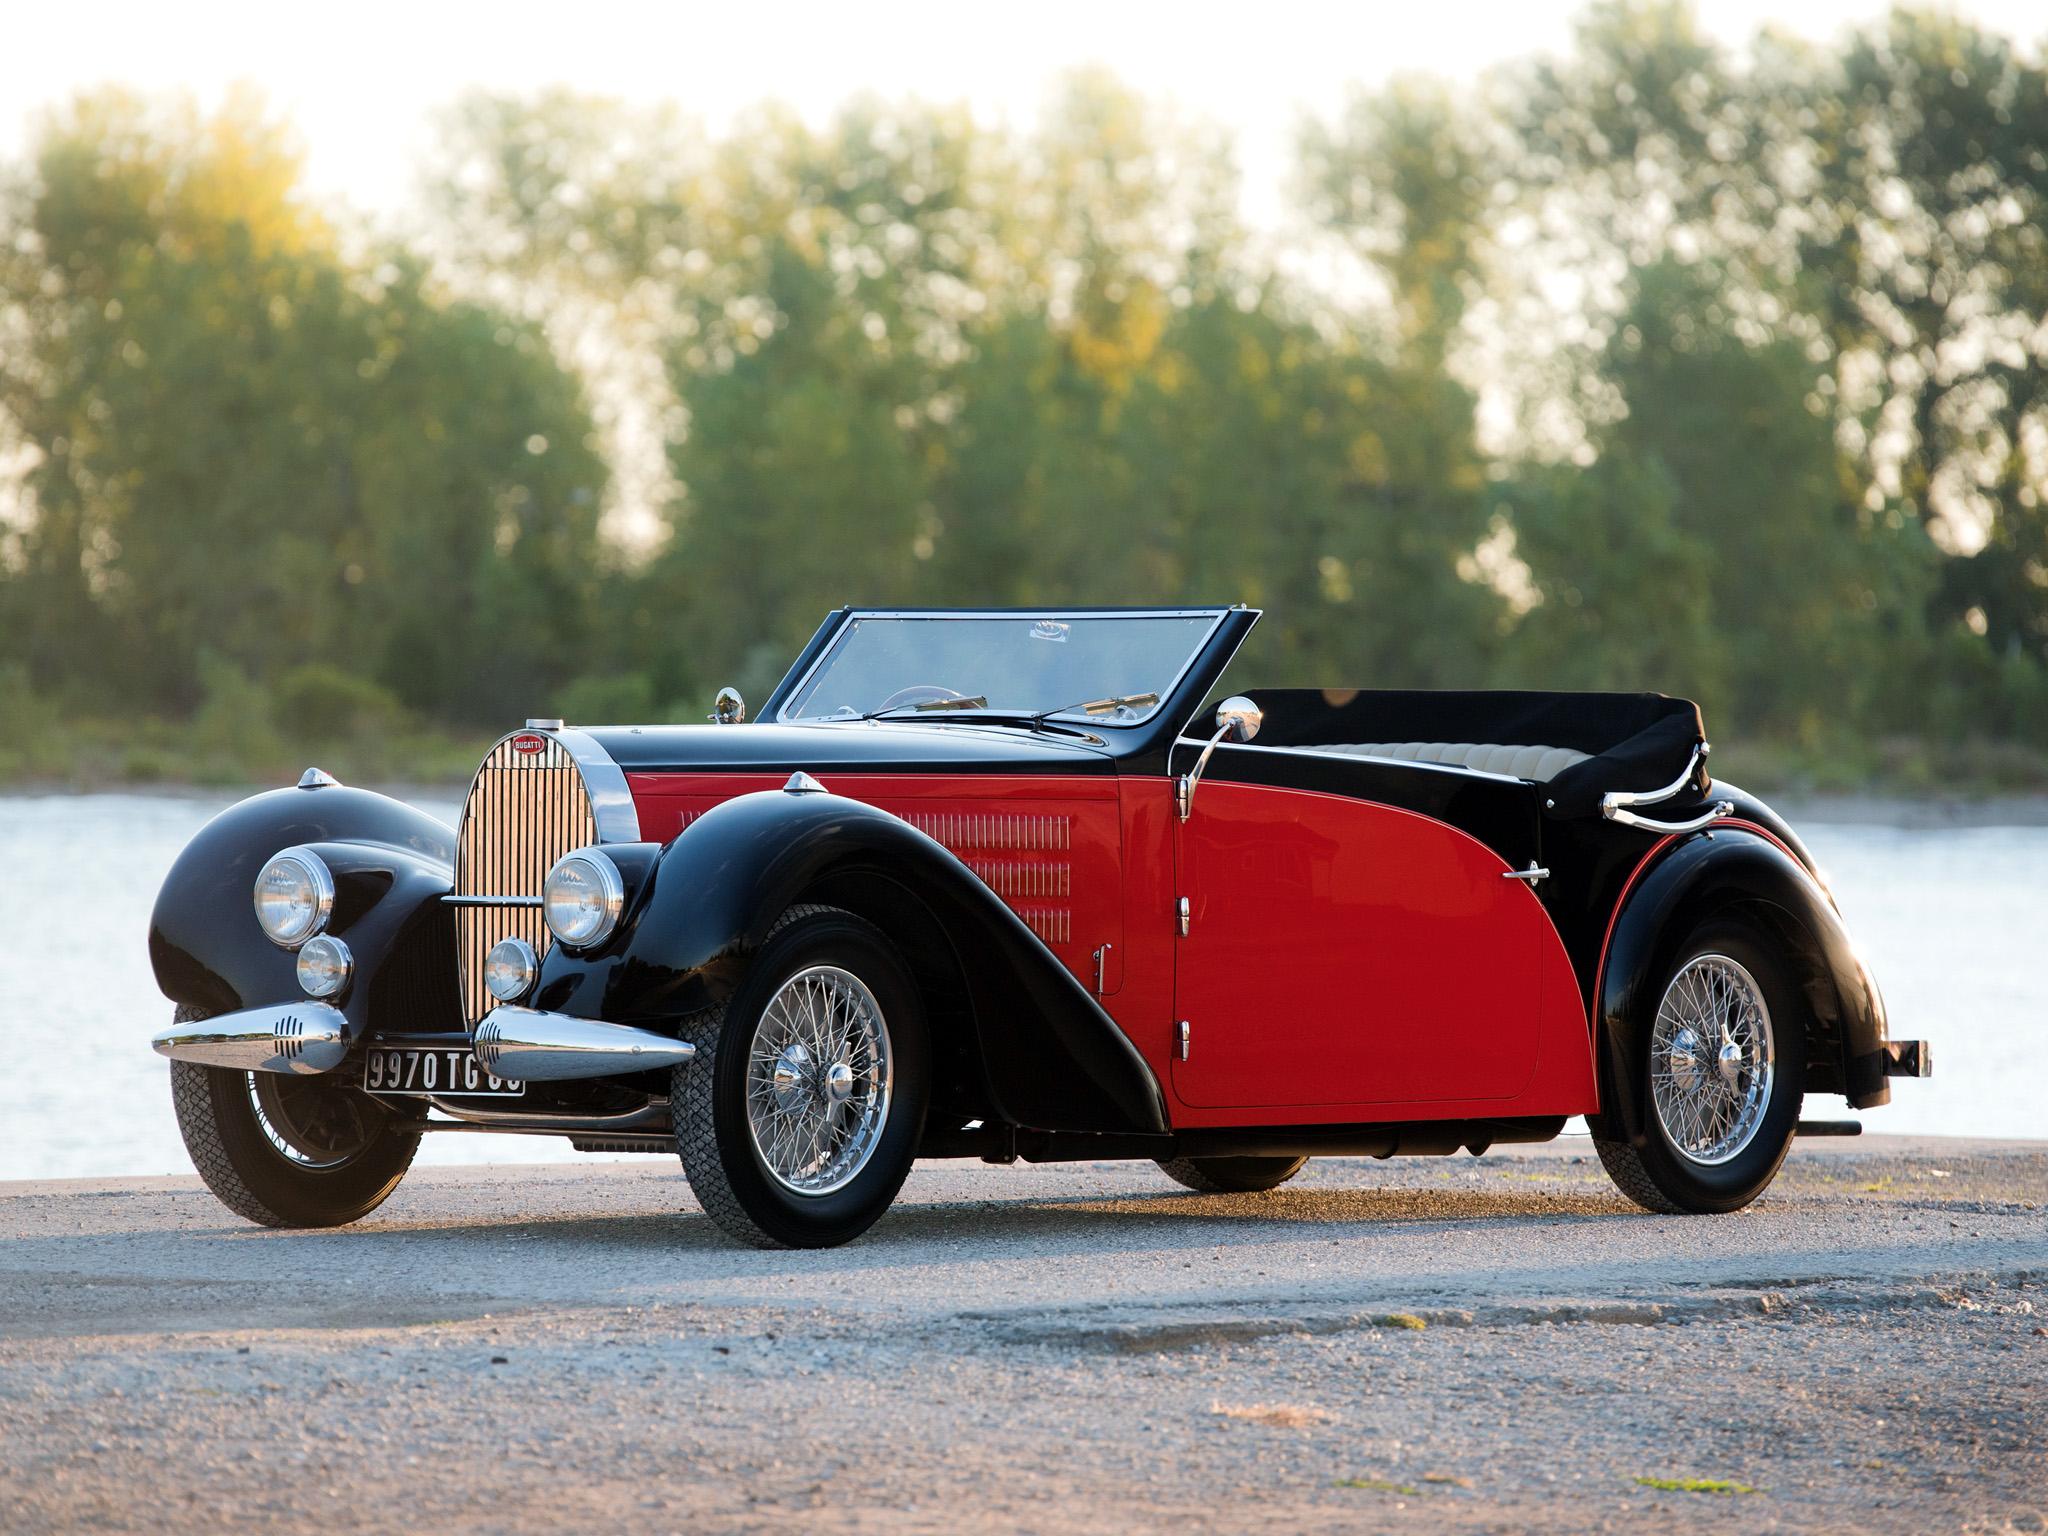 1937 bugatti type 57 stelvio cabriolet by gangloff 57569 retro convertible wallpaper 2048x1536. Black Bedroom Furniture Sets. Home Design Ideas